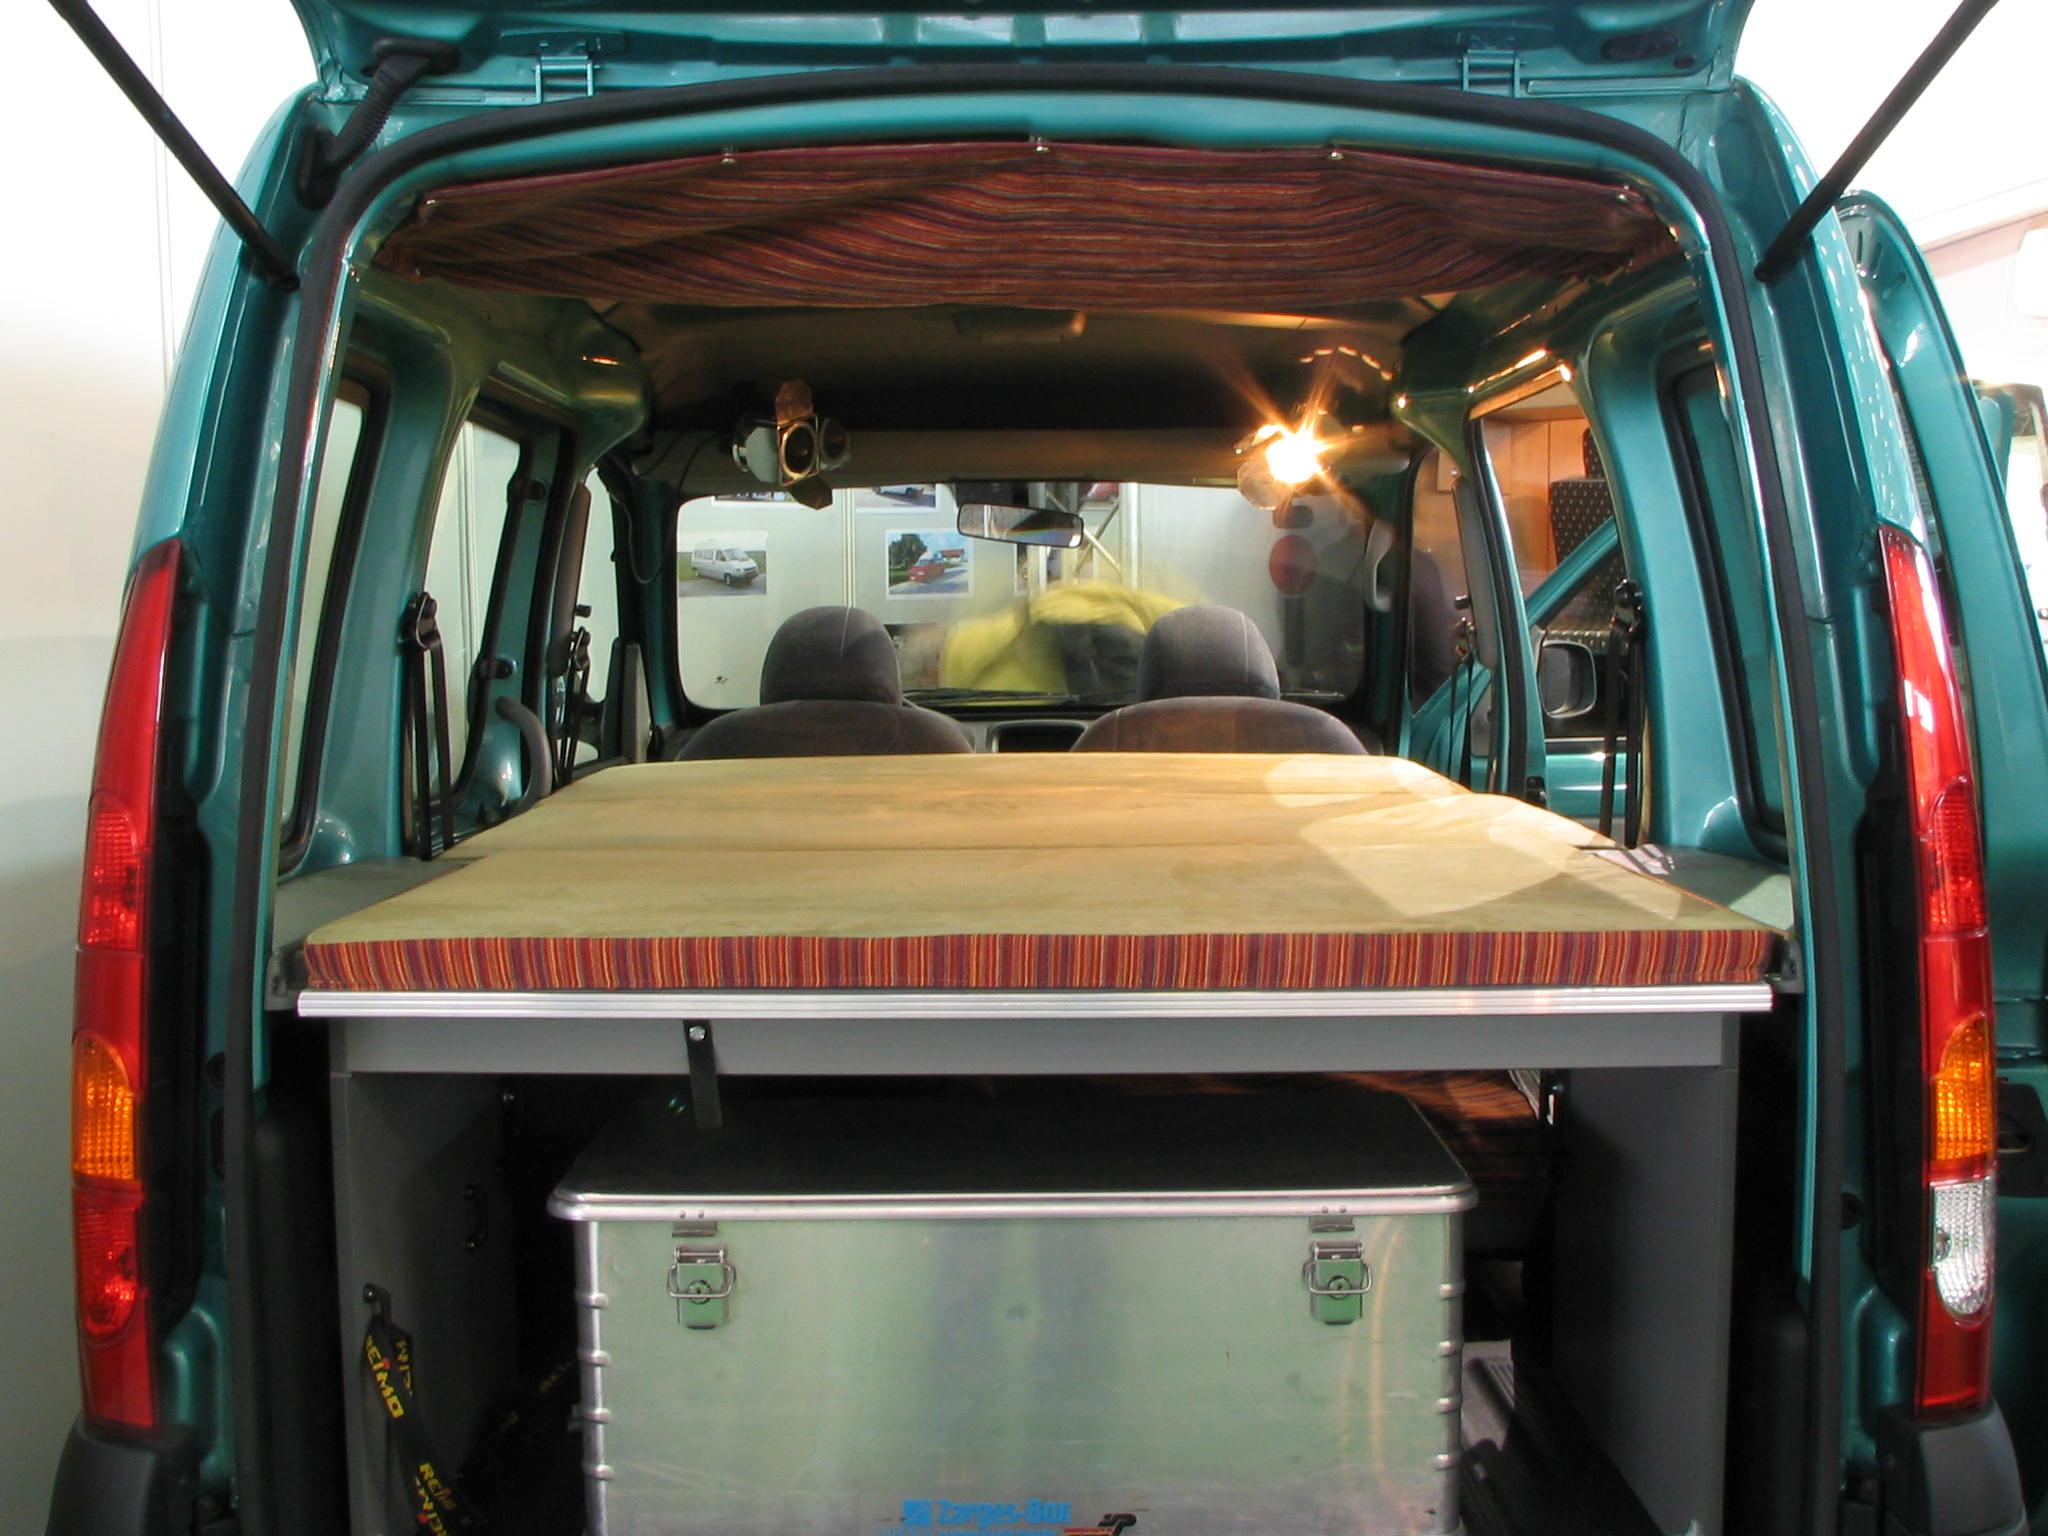 renault kangoo mit campingeinrichtung. Black Bedroom Furniture Sets. Home Design Ideas